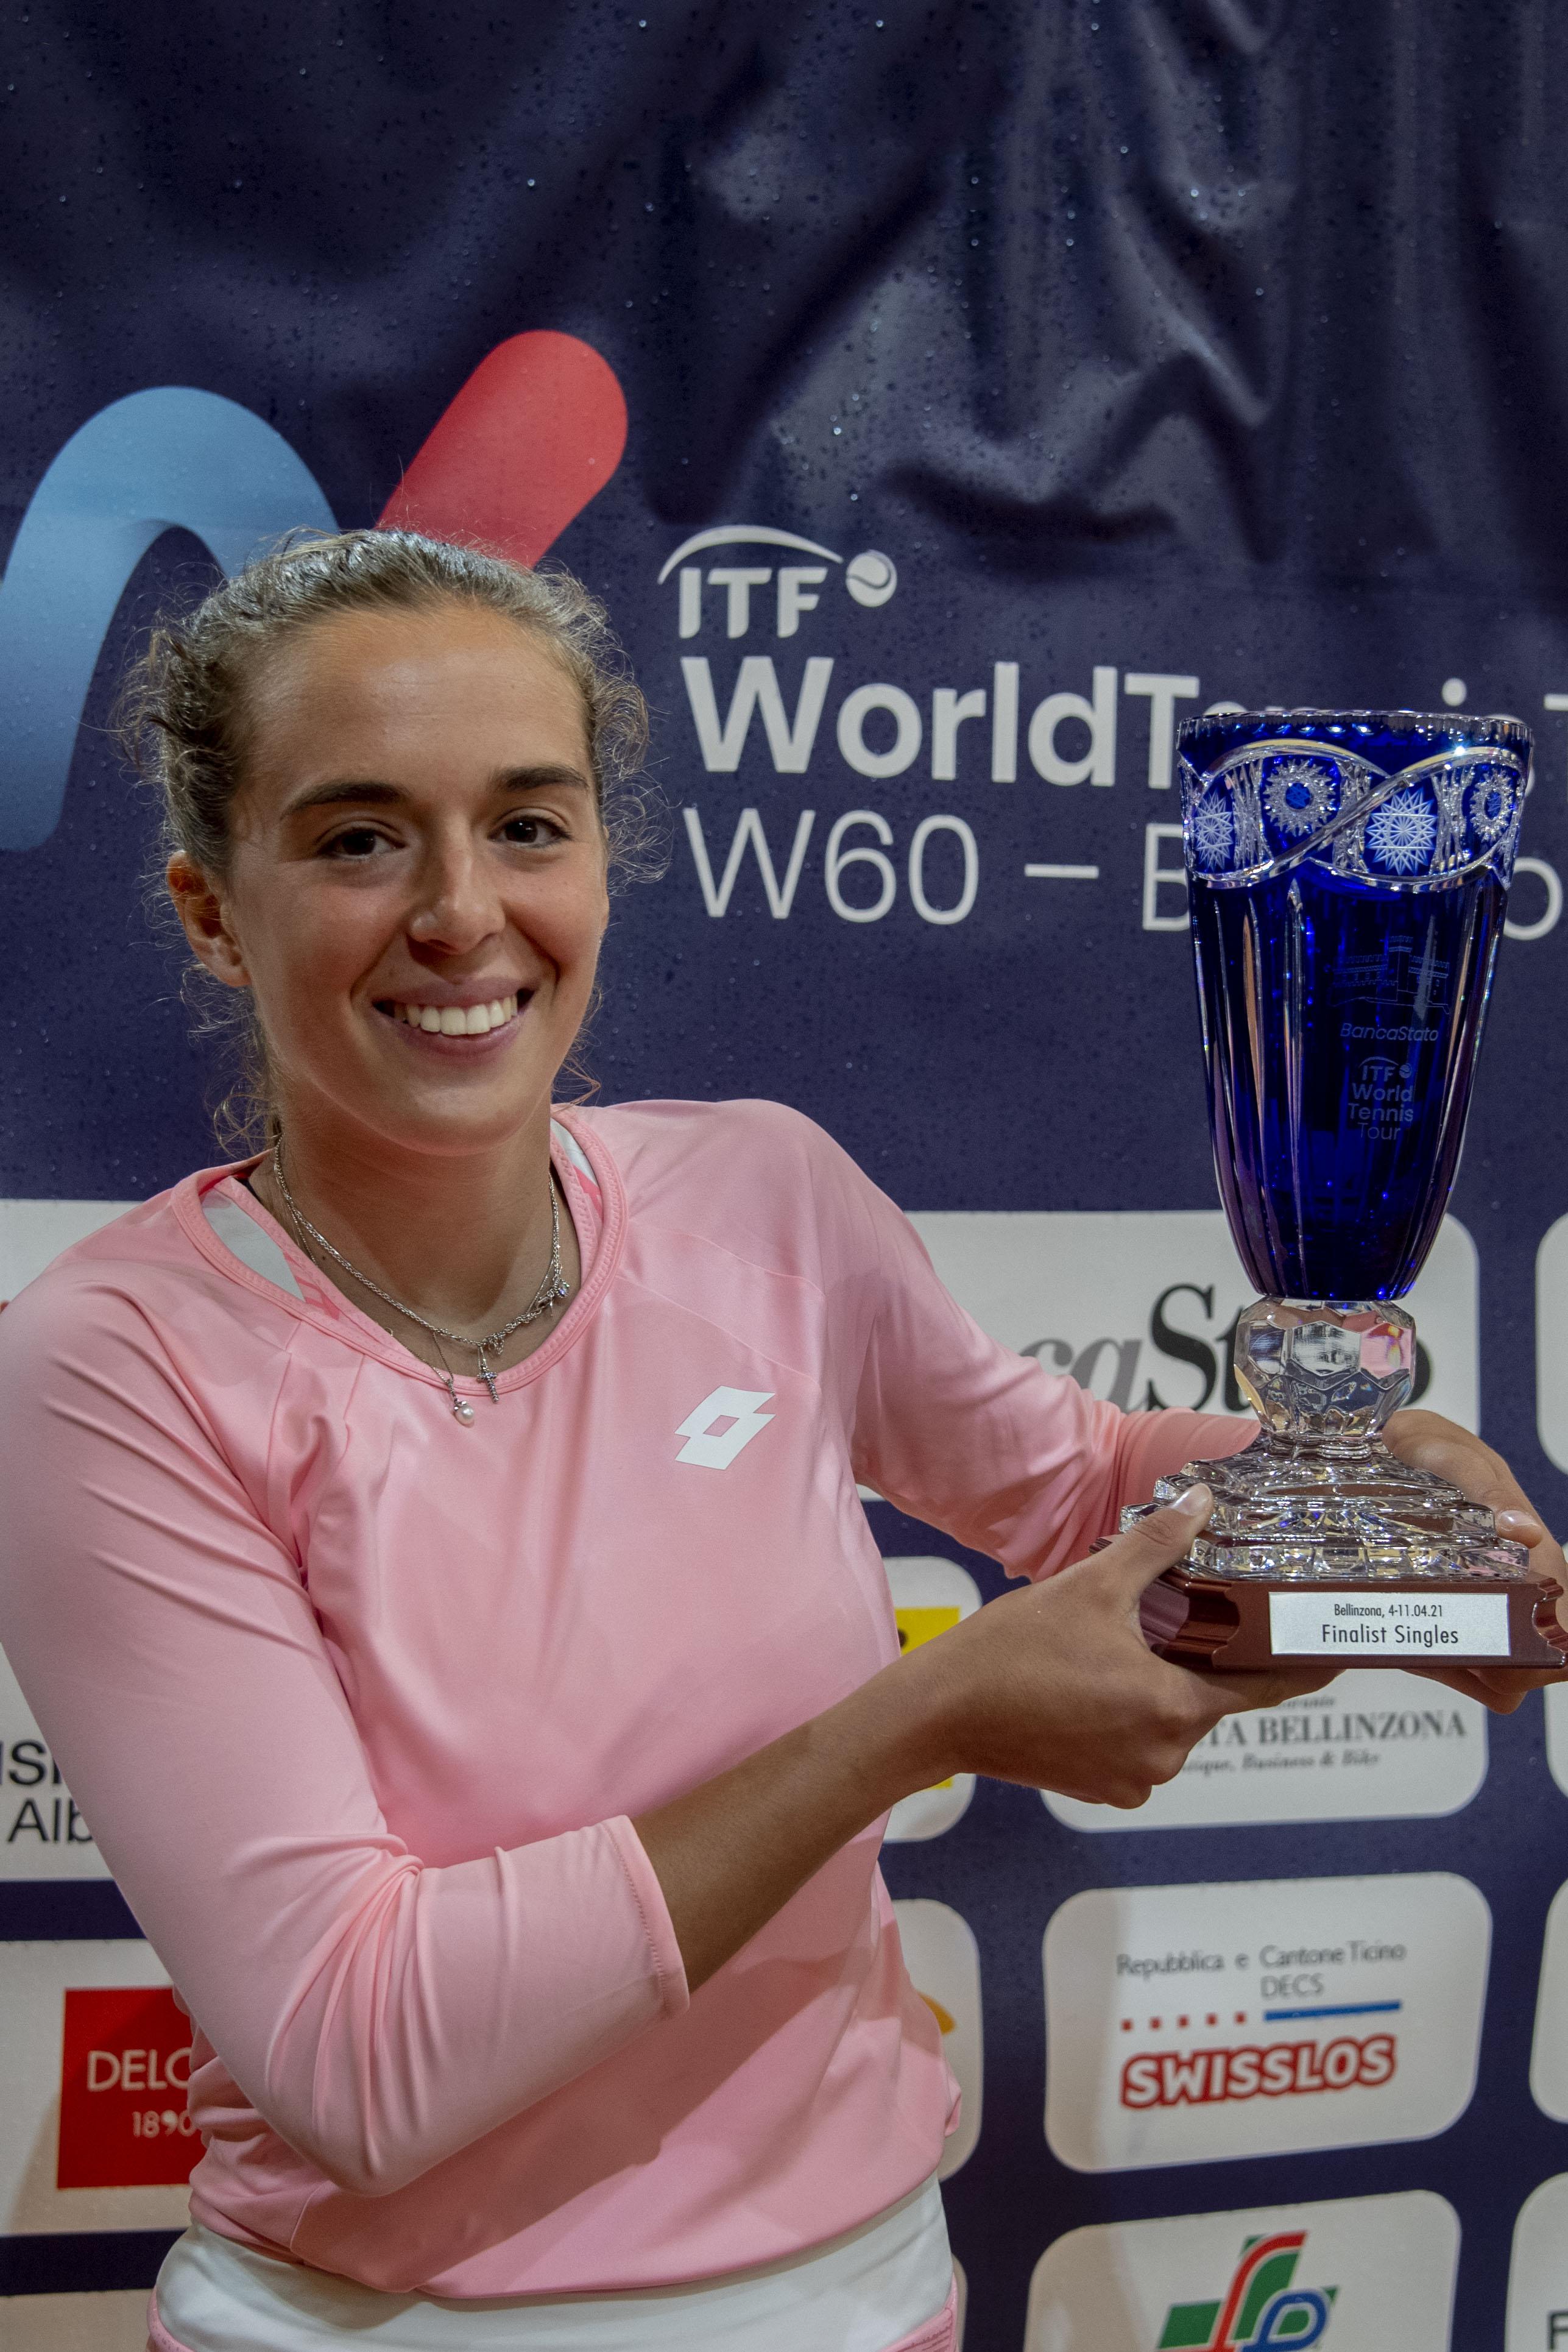 2021.04.11-ITF-WorldTennisTour-Final-Lucia-Bronzetti-ITA-Second-Place-05